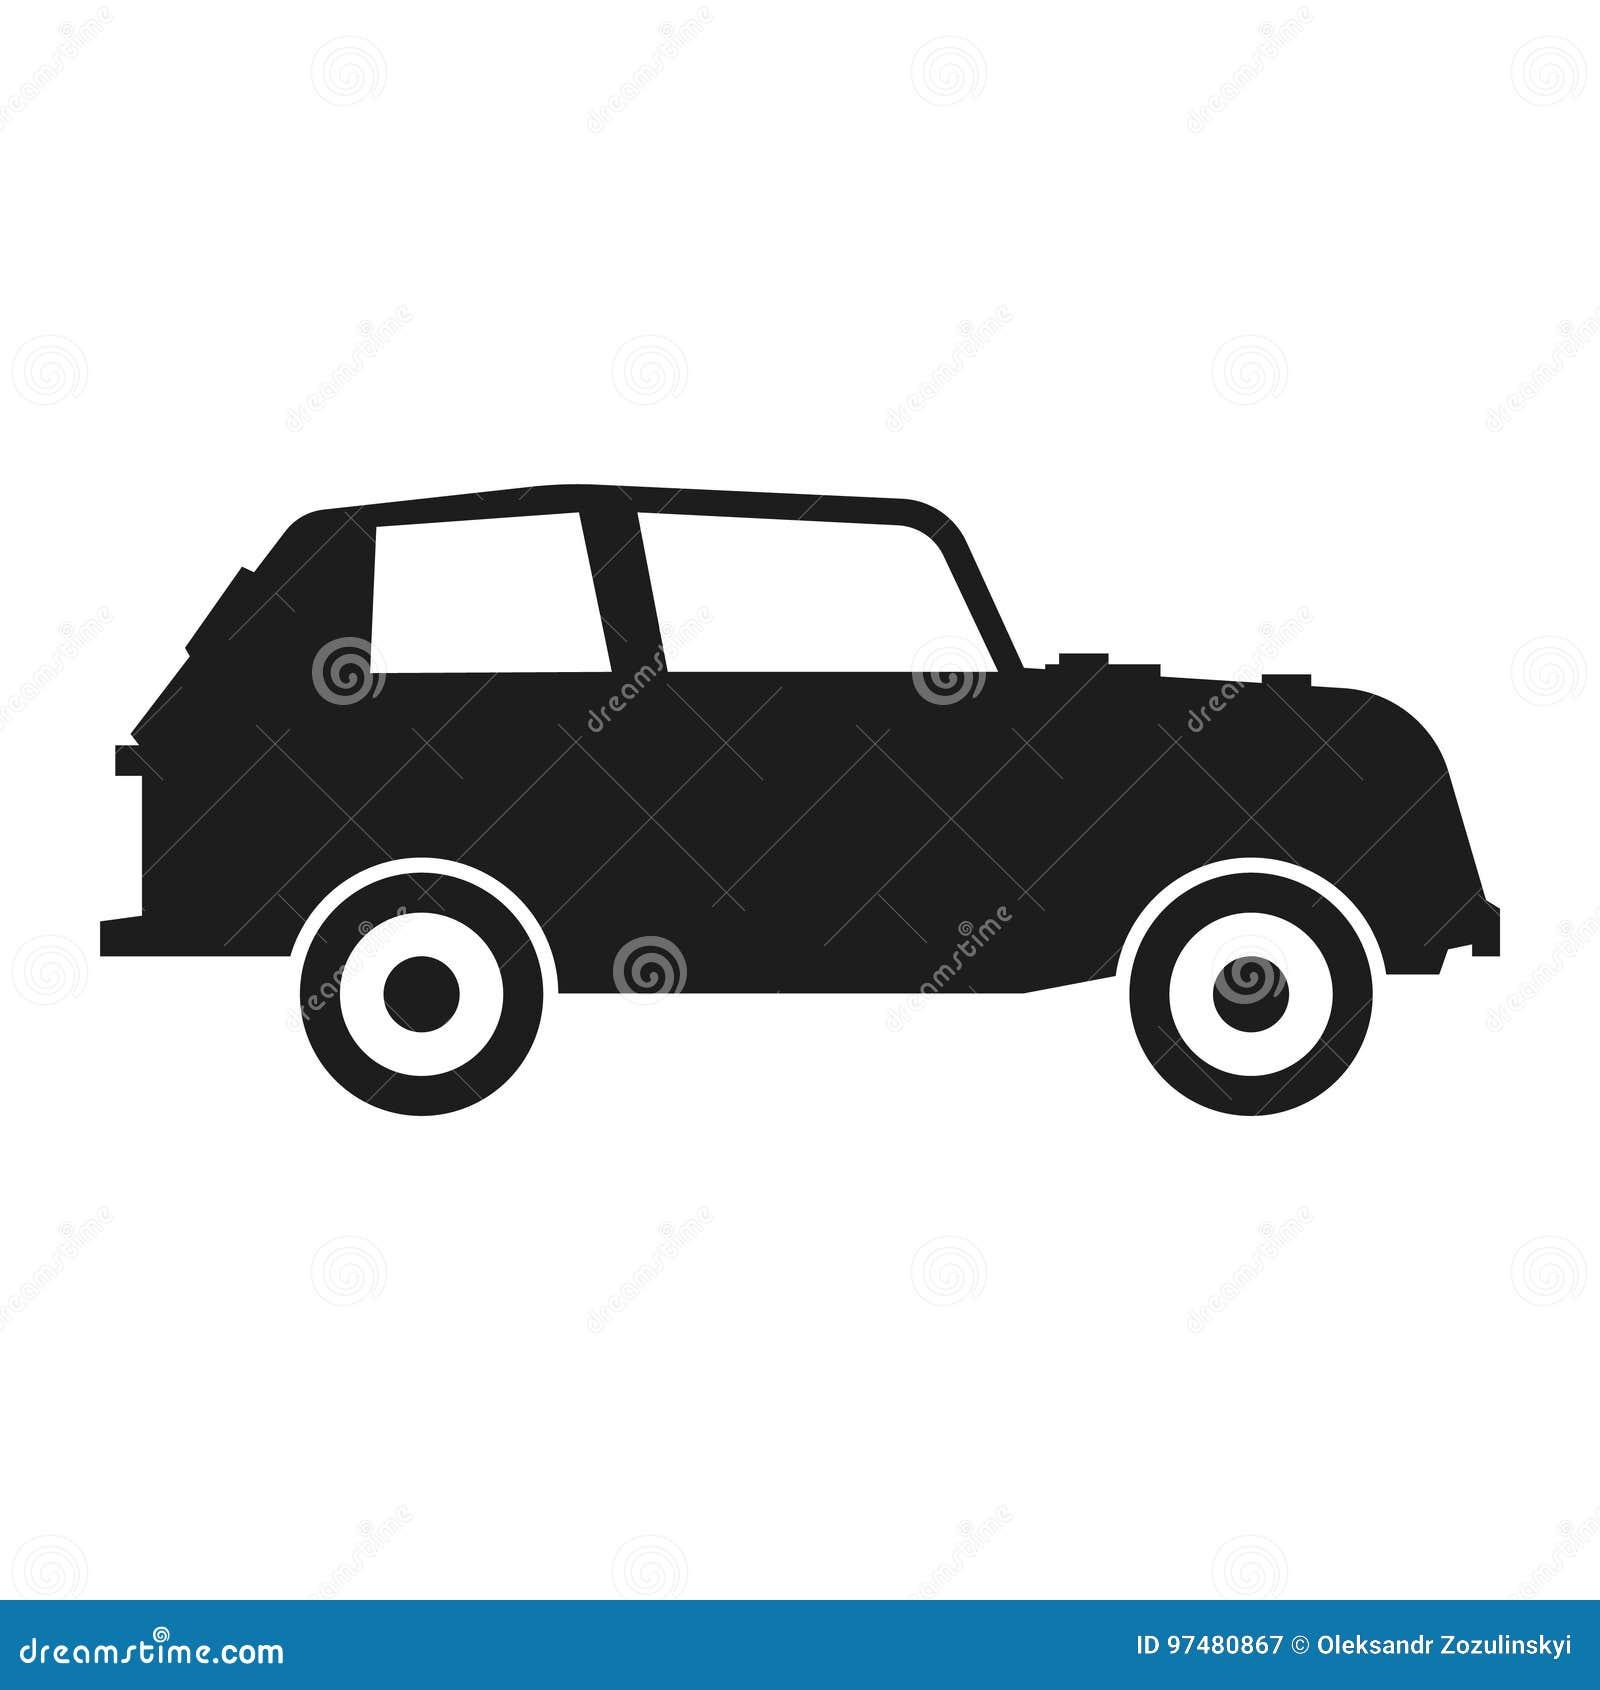 Hatchback Silhouette Stock Illustration Illustration Of Auto 97480867